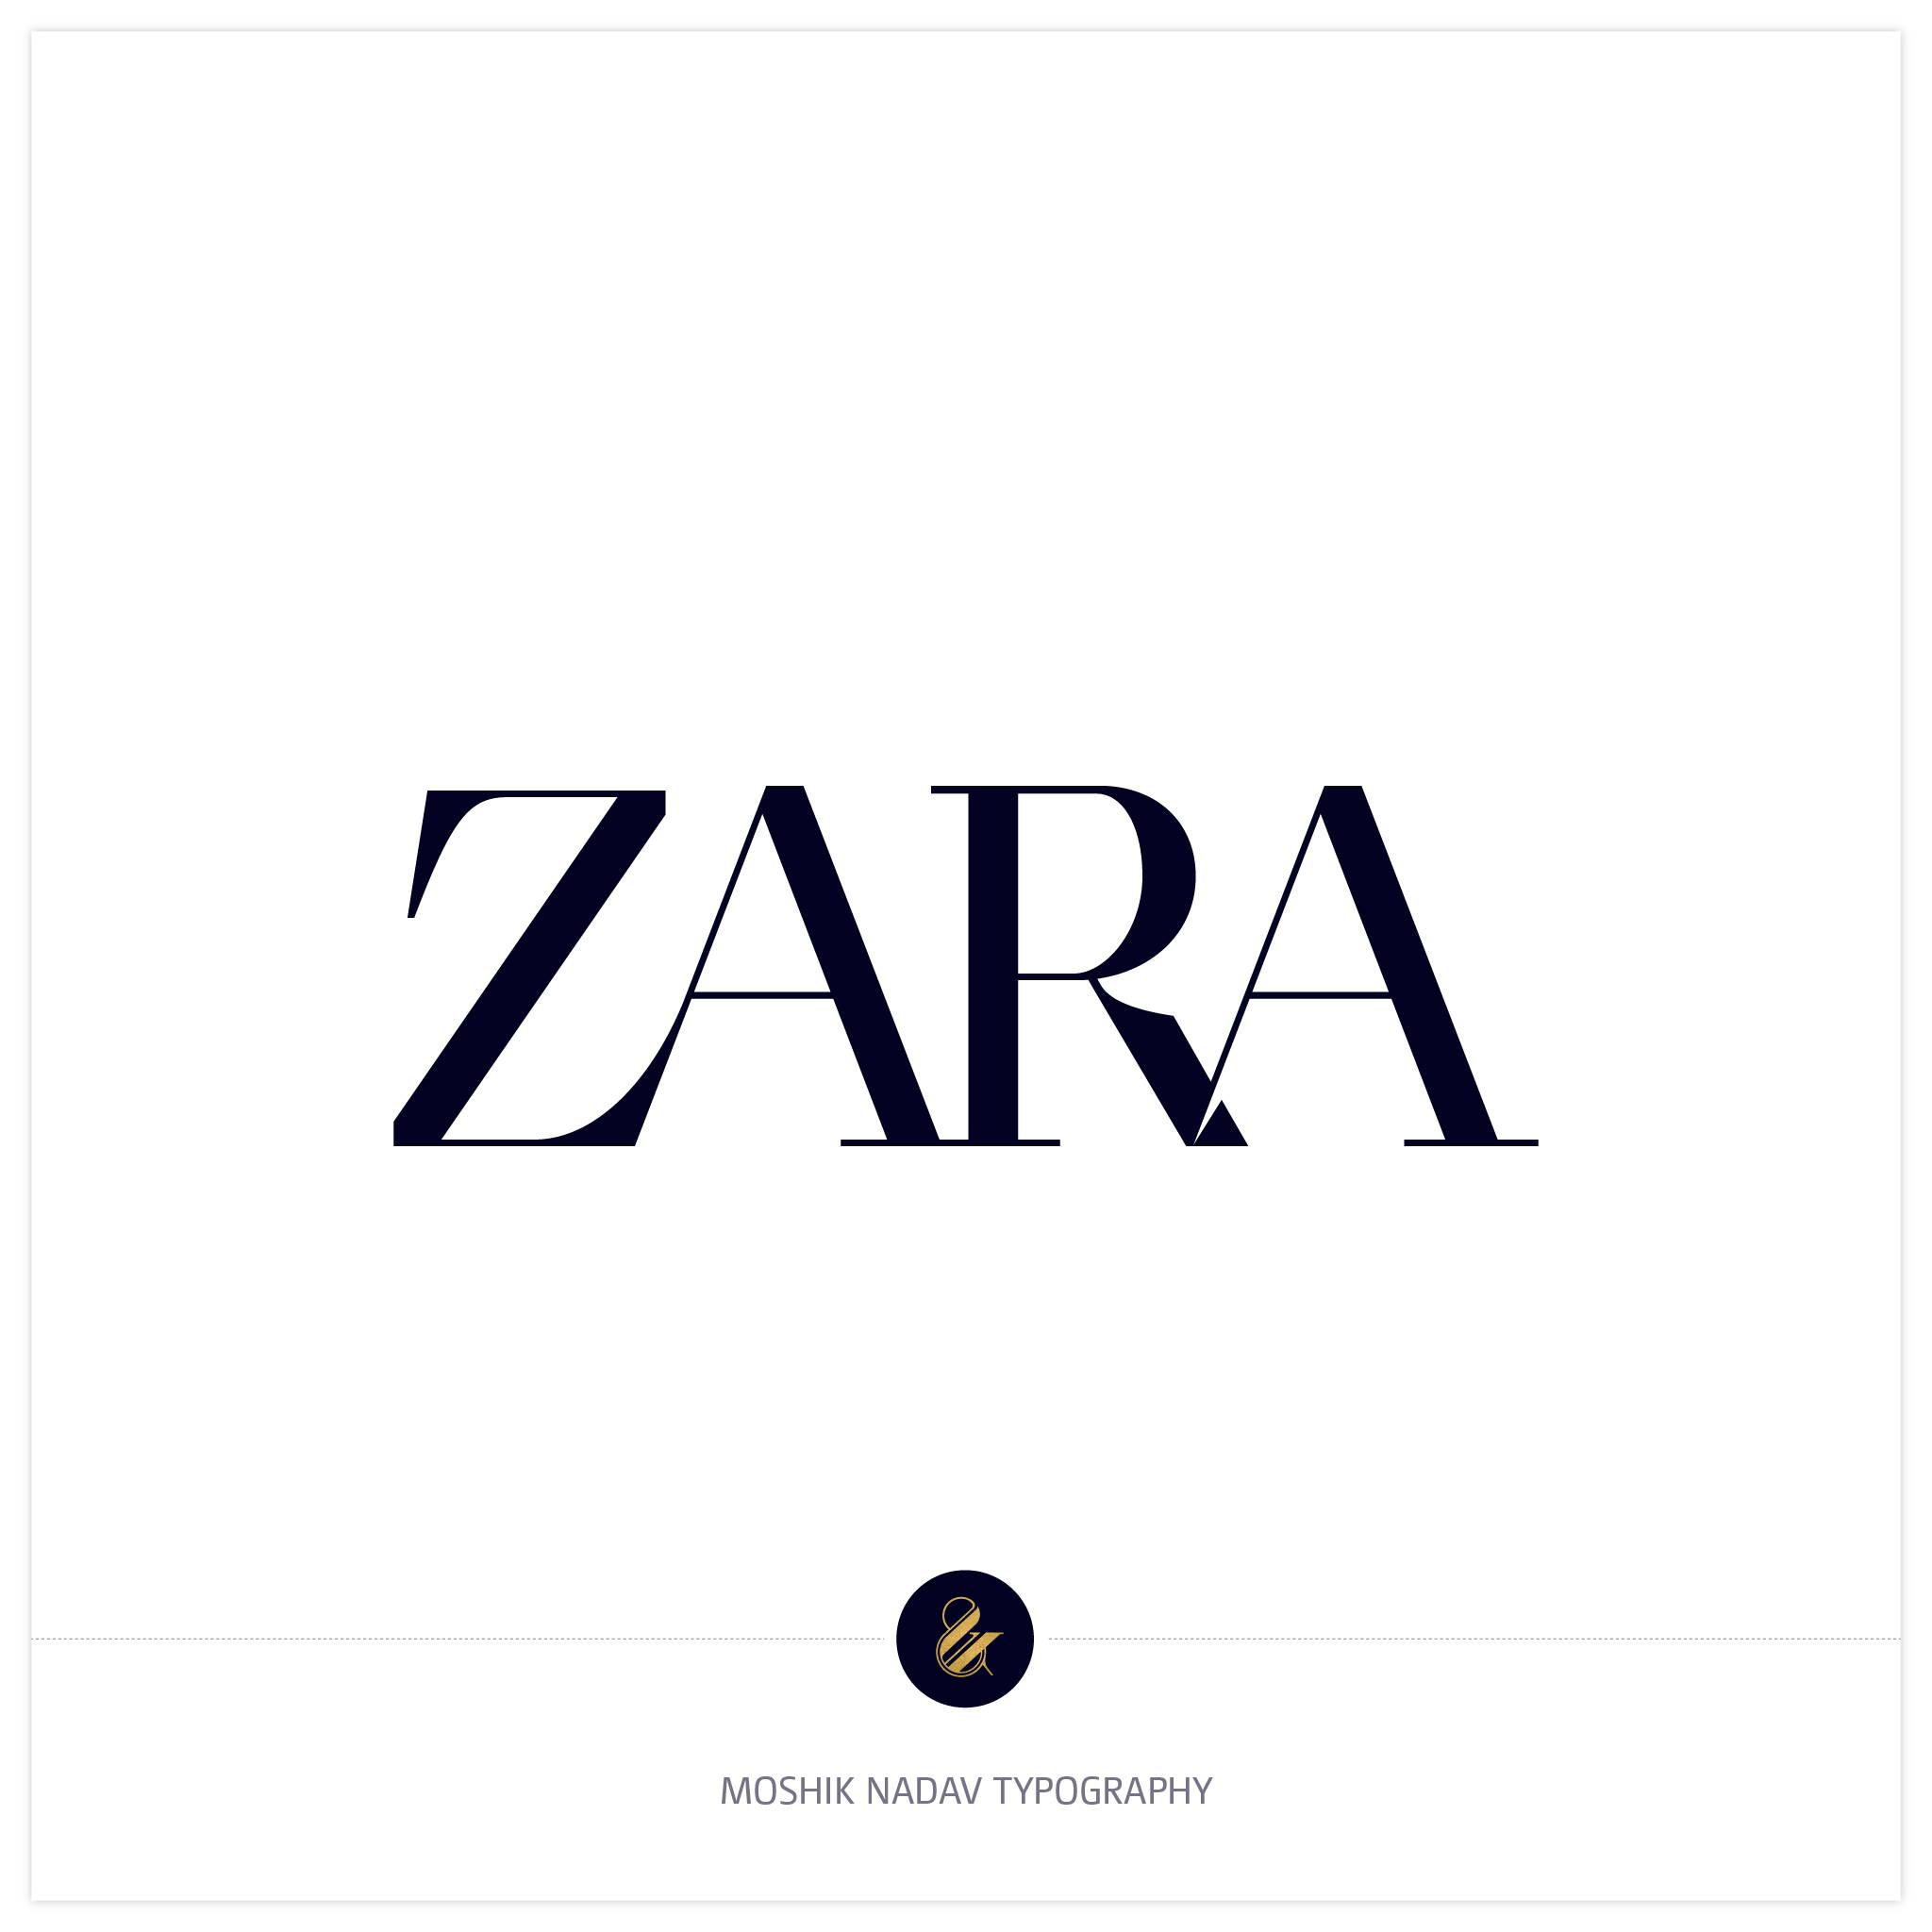 Moshik Nadav version for Zara new logo design